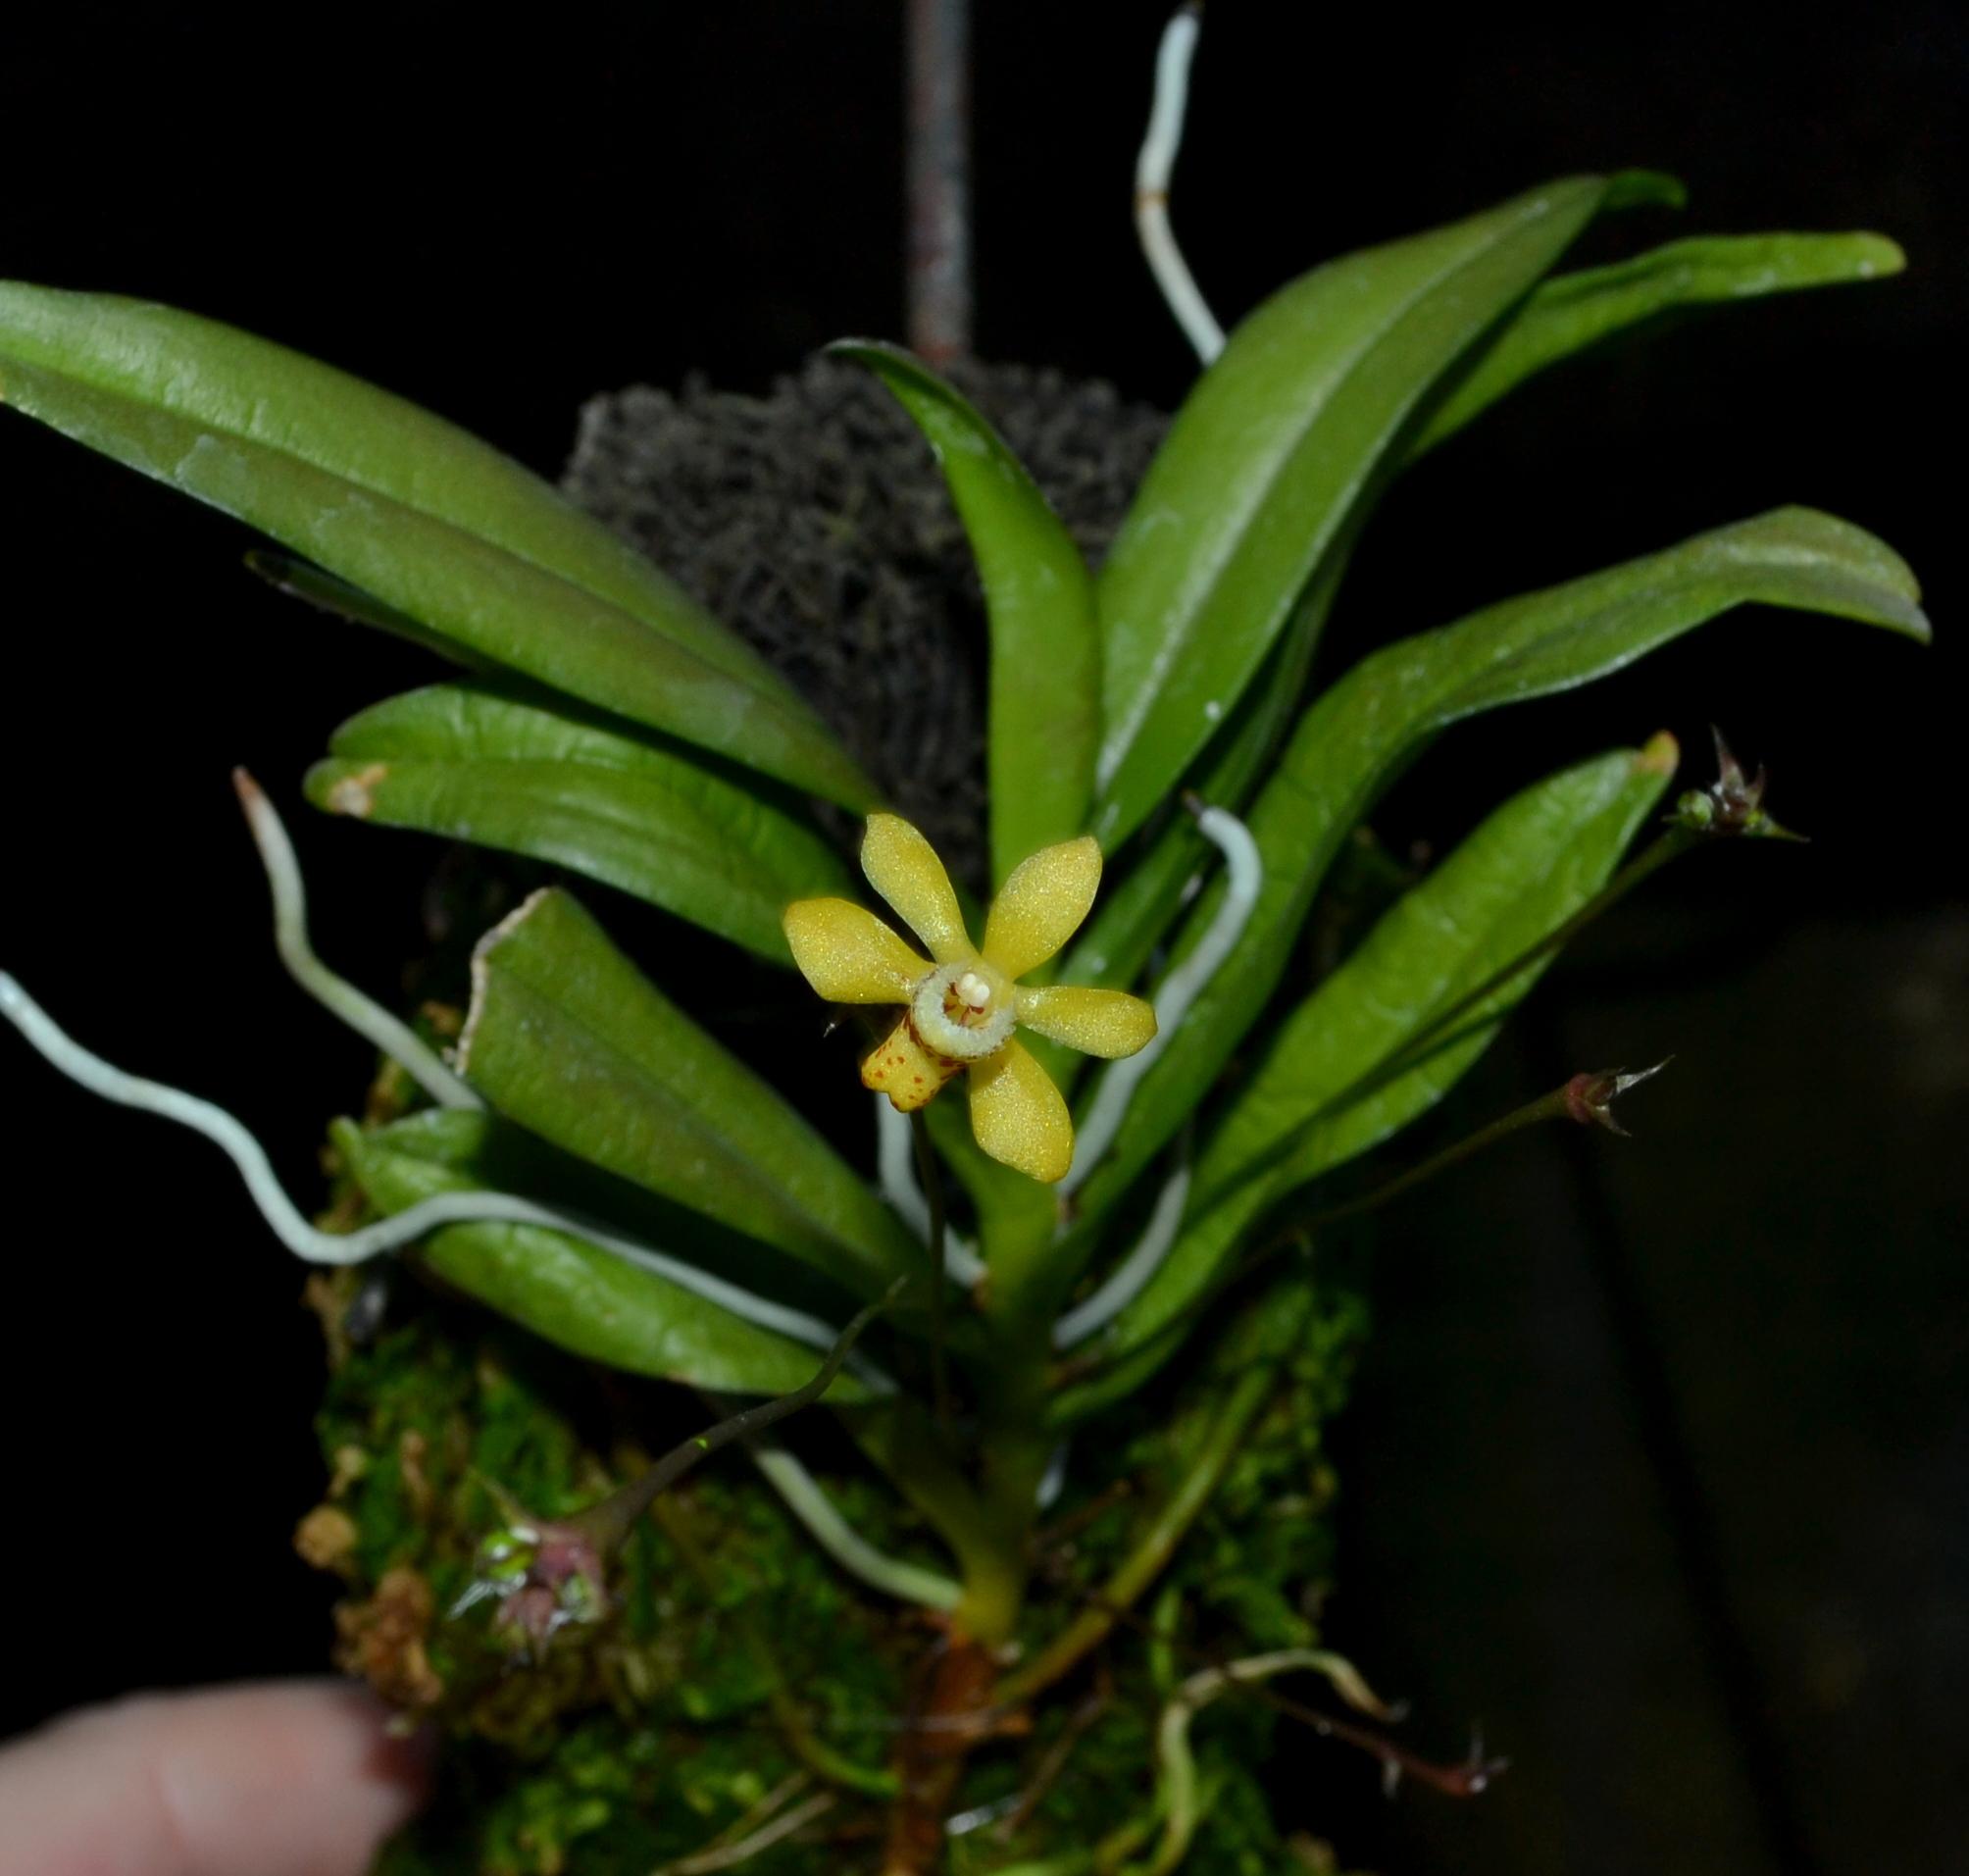 Thrixspermum bromeliforme 3-8-13.jpg